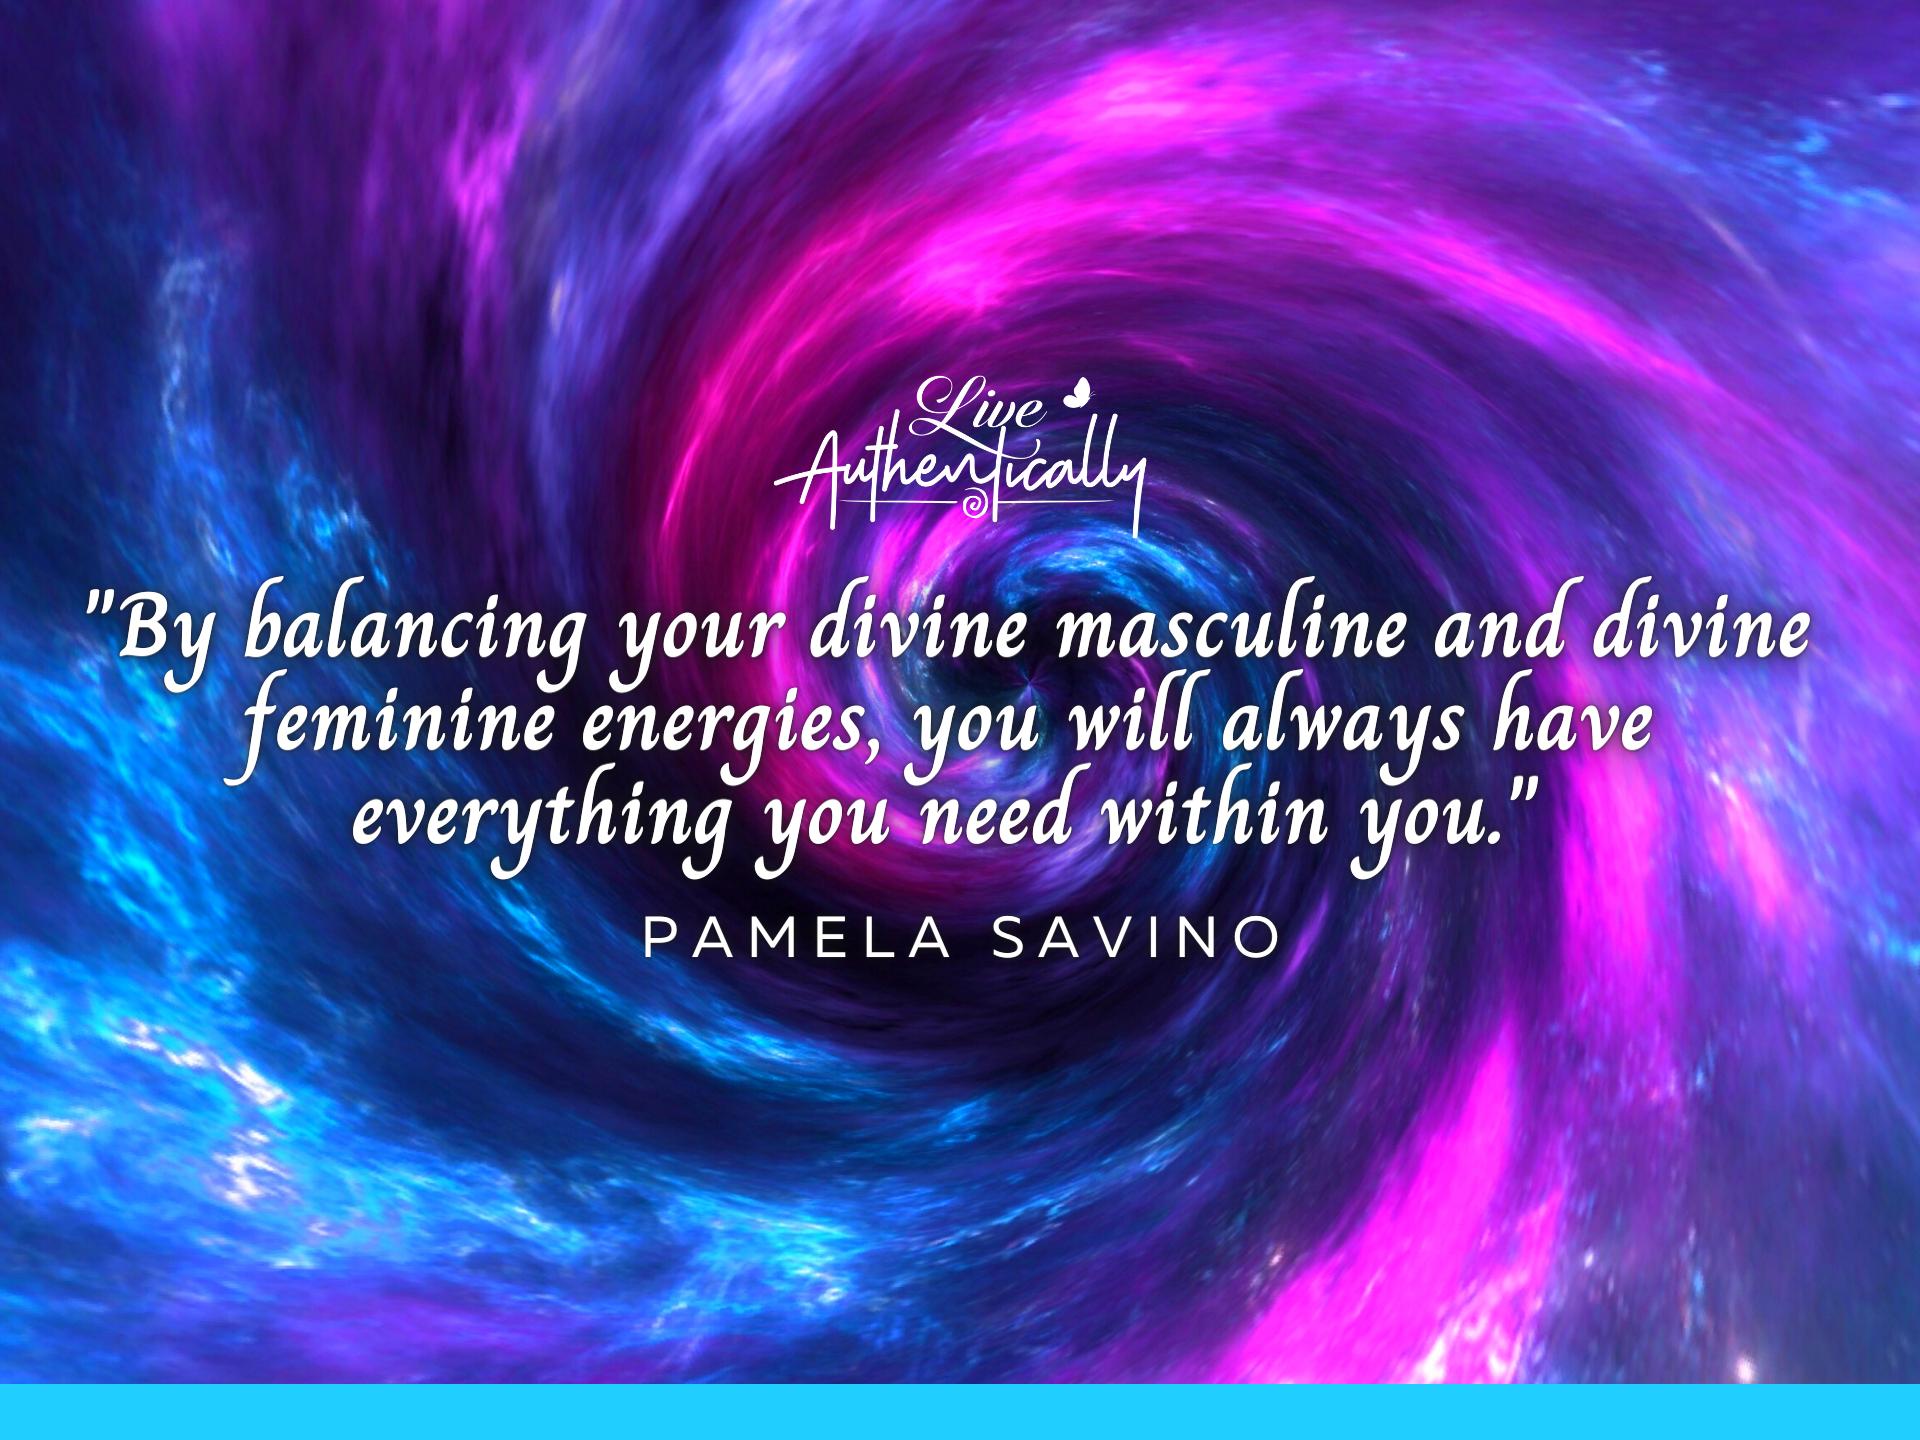 masculine and feminine energies